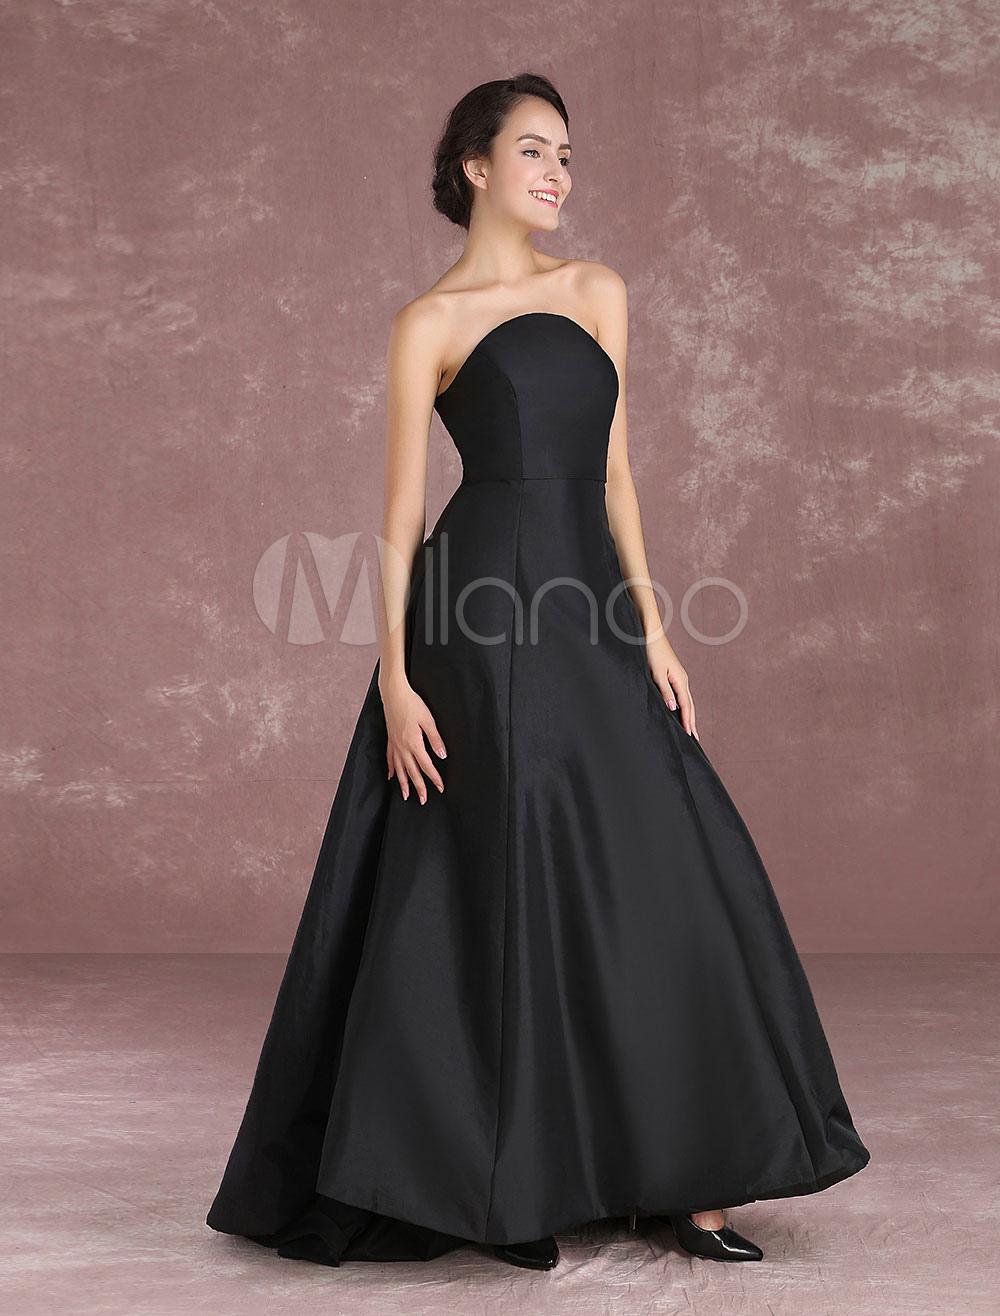 Black Celebrity Dress Taffeta Strapless Sleeveless Prom Dress Oscar Red Carpet Dress With Train Milanoo